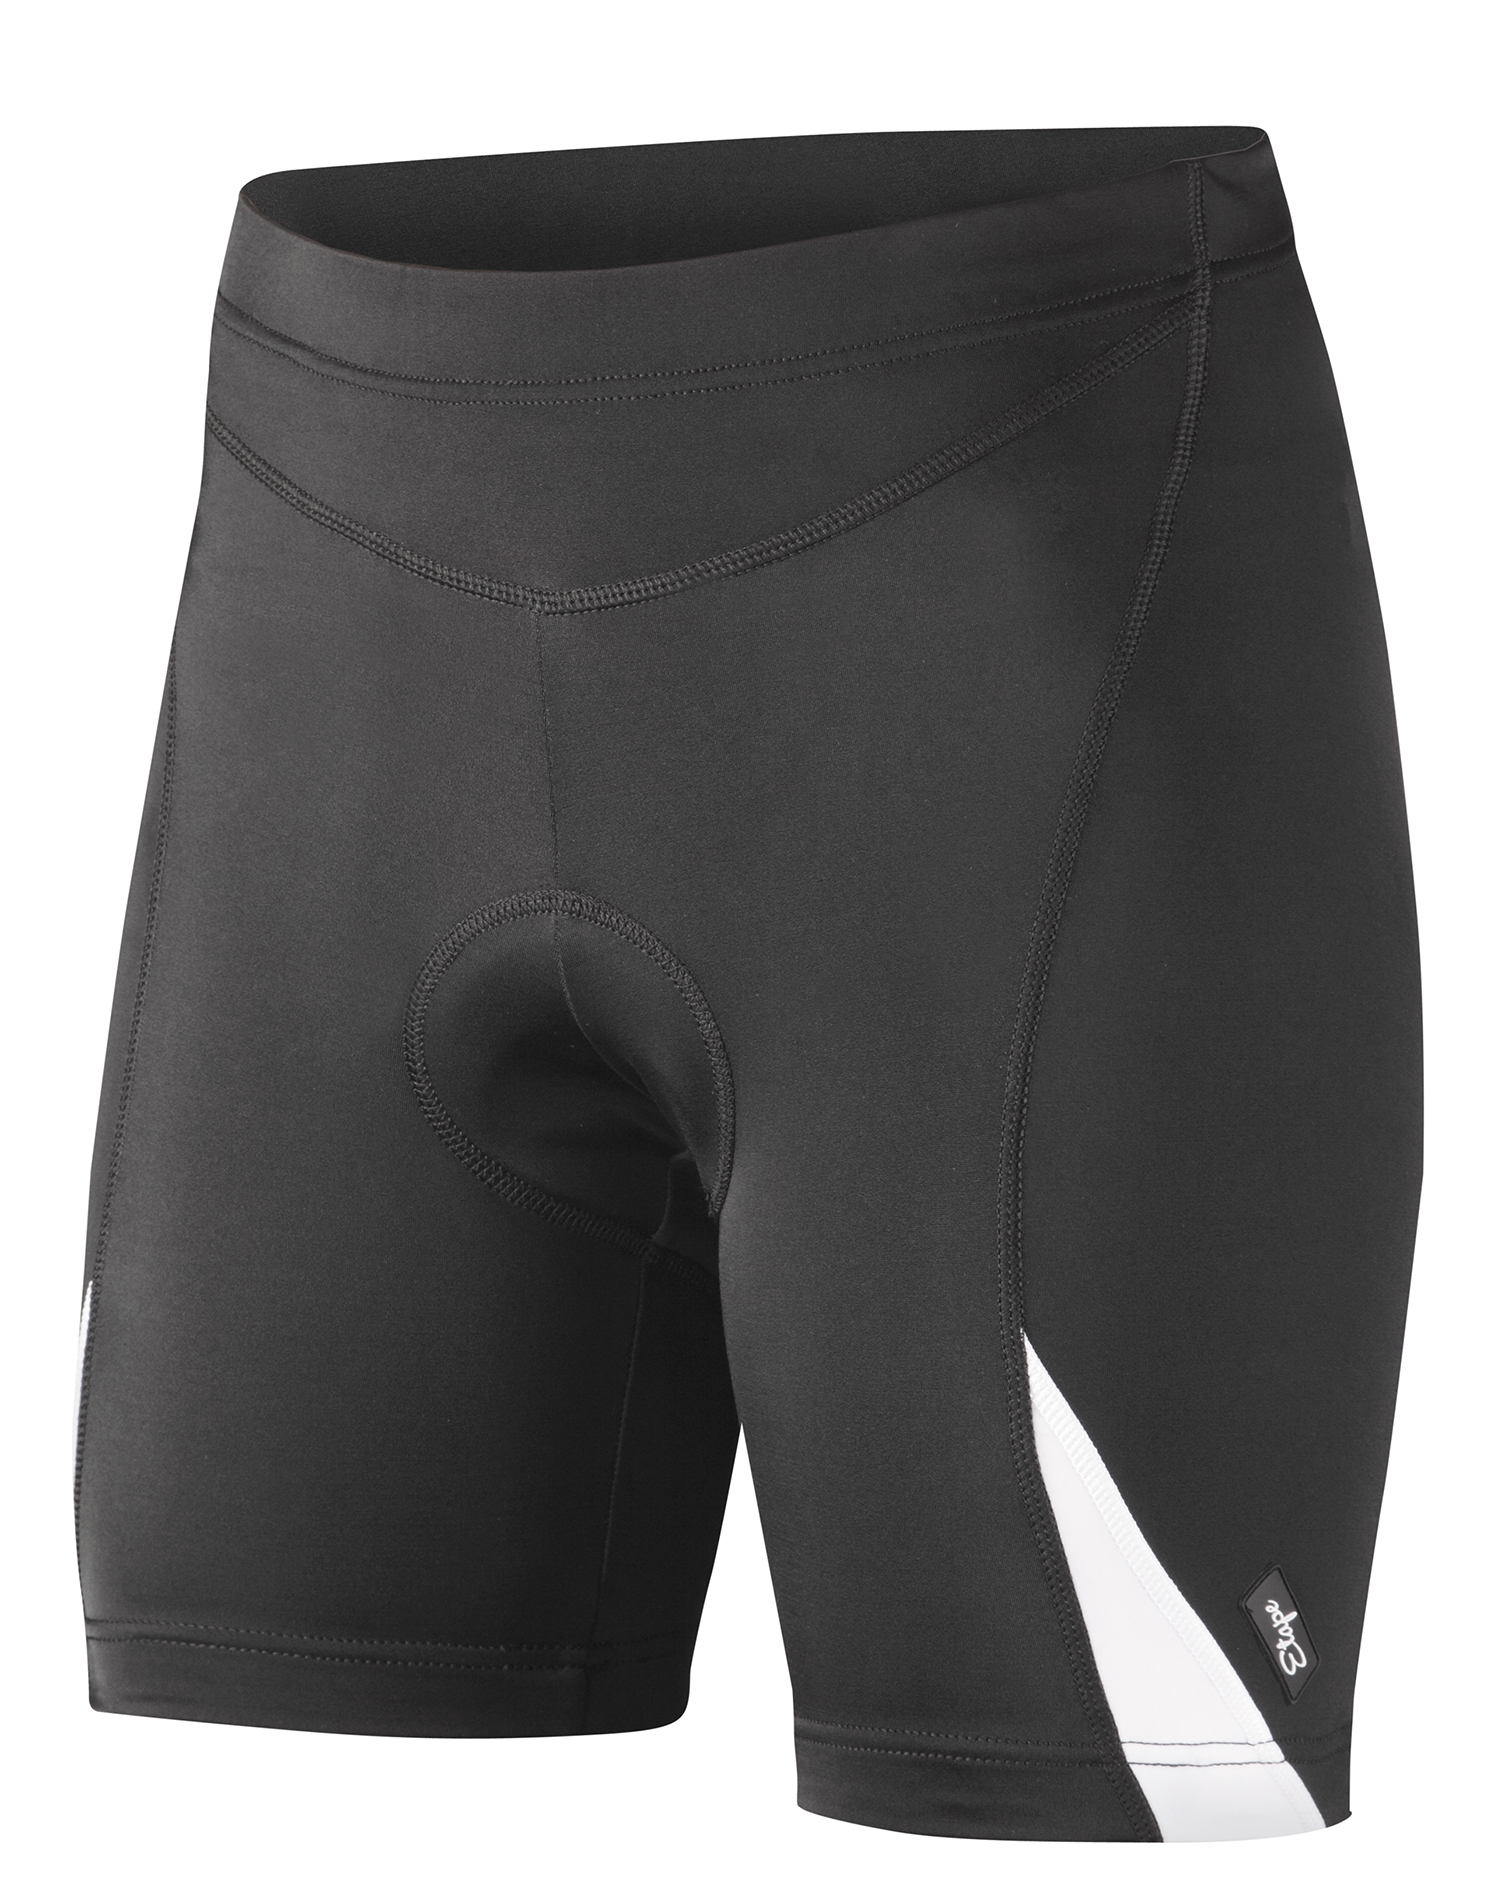 Dámské cyklistické kraťasy ETAPE Natty, vel. XL, černá/bílá s vložkou model 2017 (Dámské cyklistické kraťasy Etape, s dámskou elastickou vložkou )